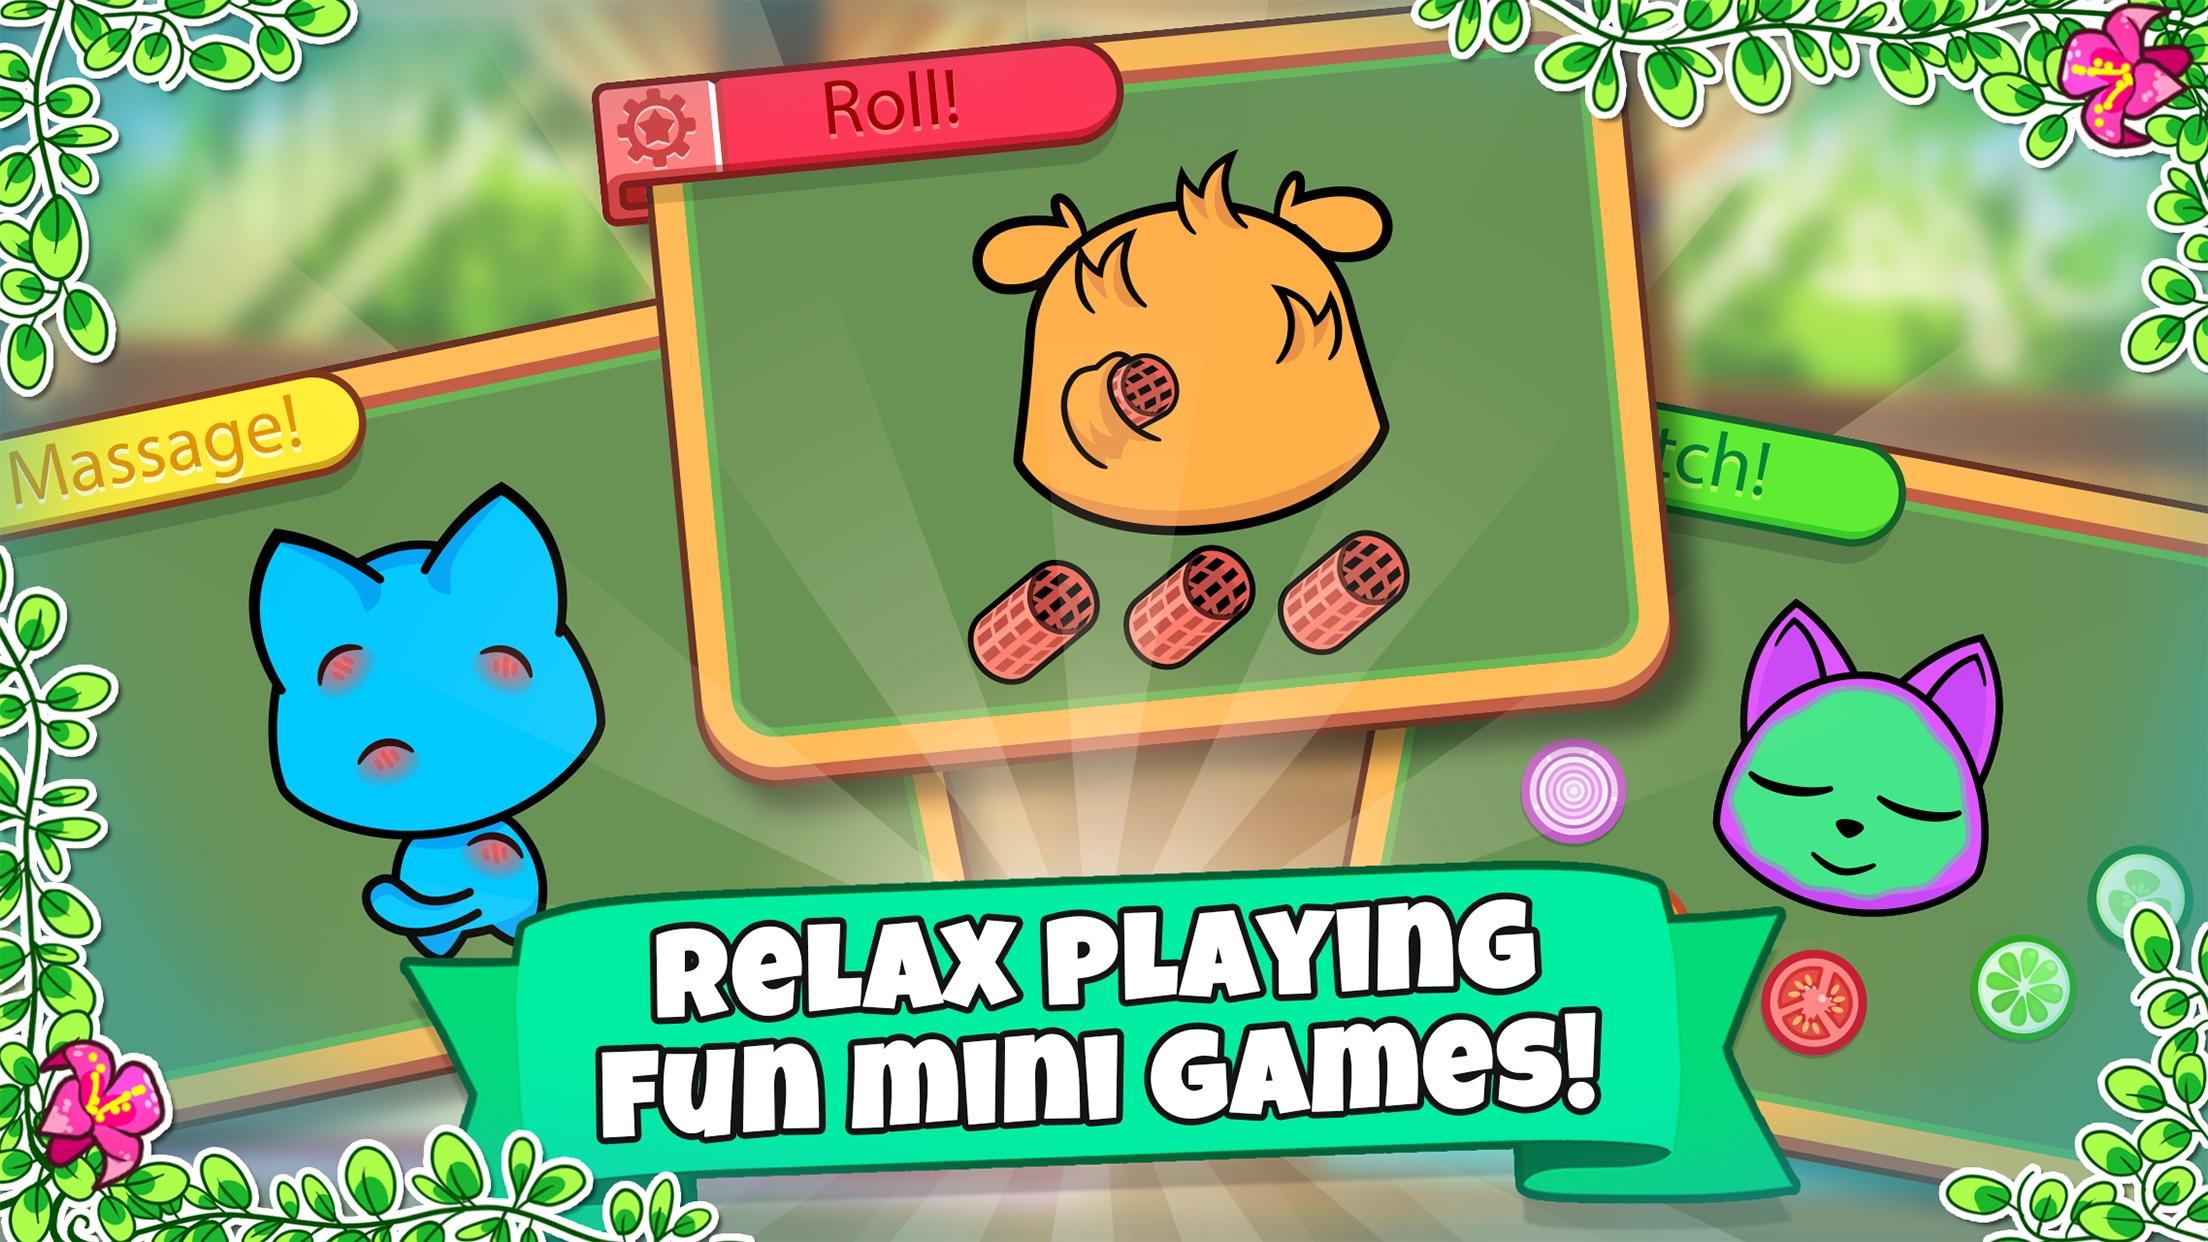 Forest Folks - Pet Spa and Animal Resort Game Screenshot